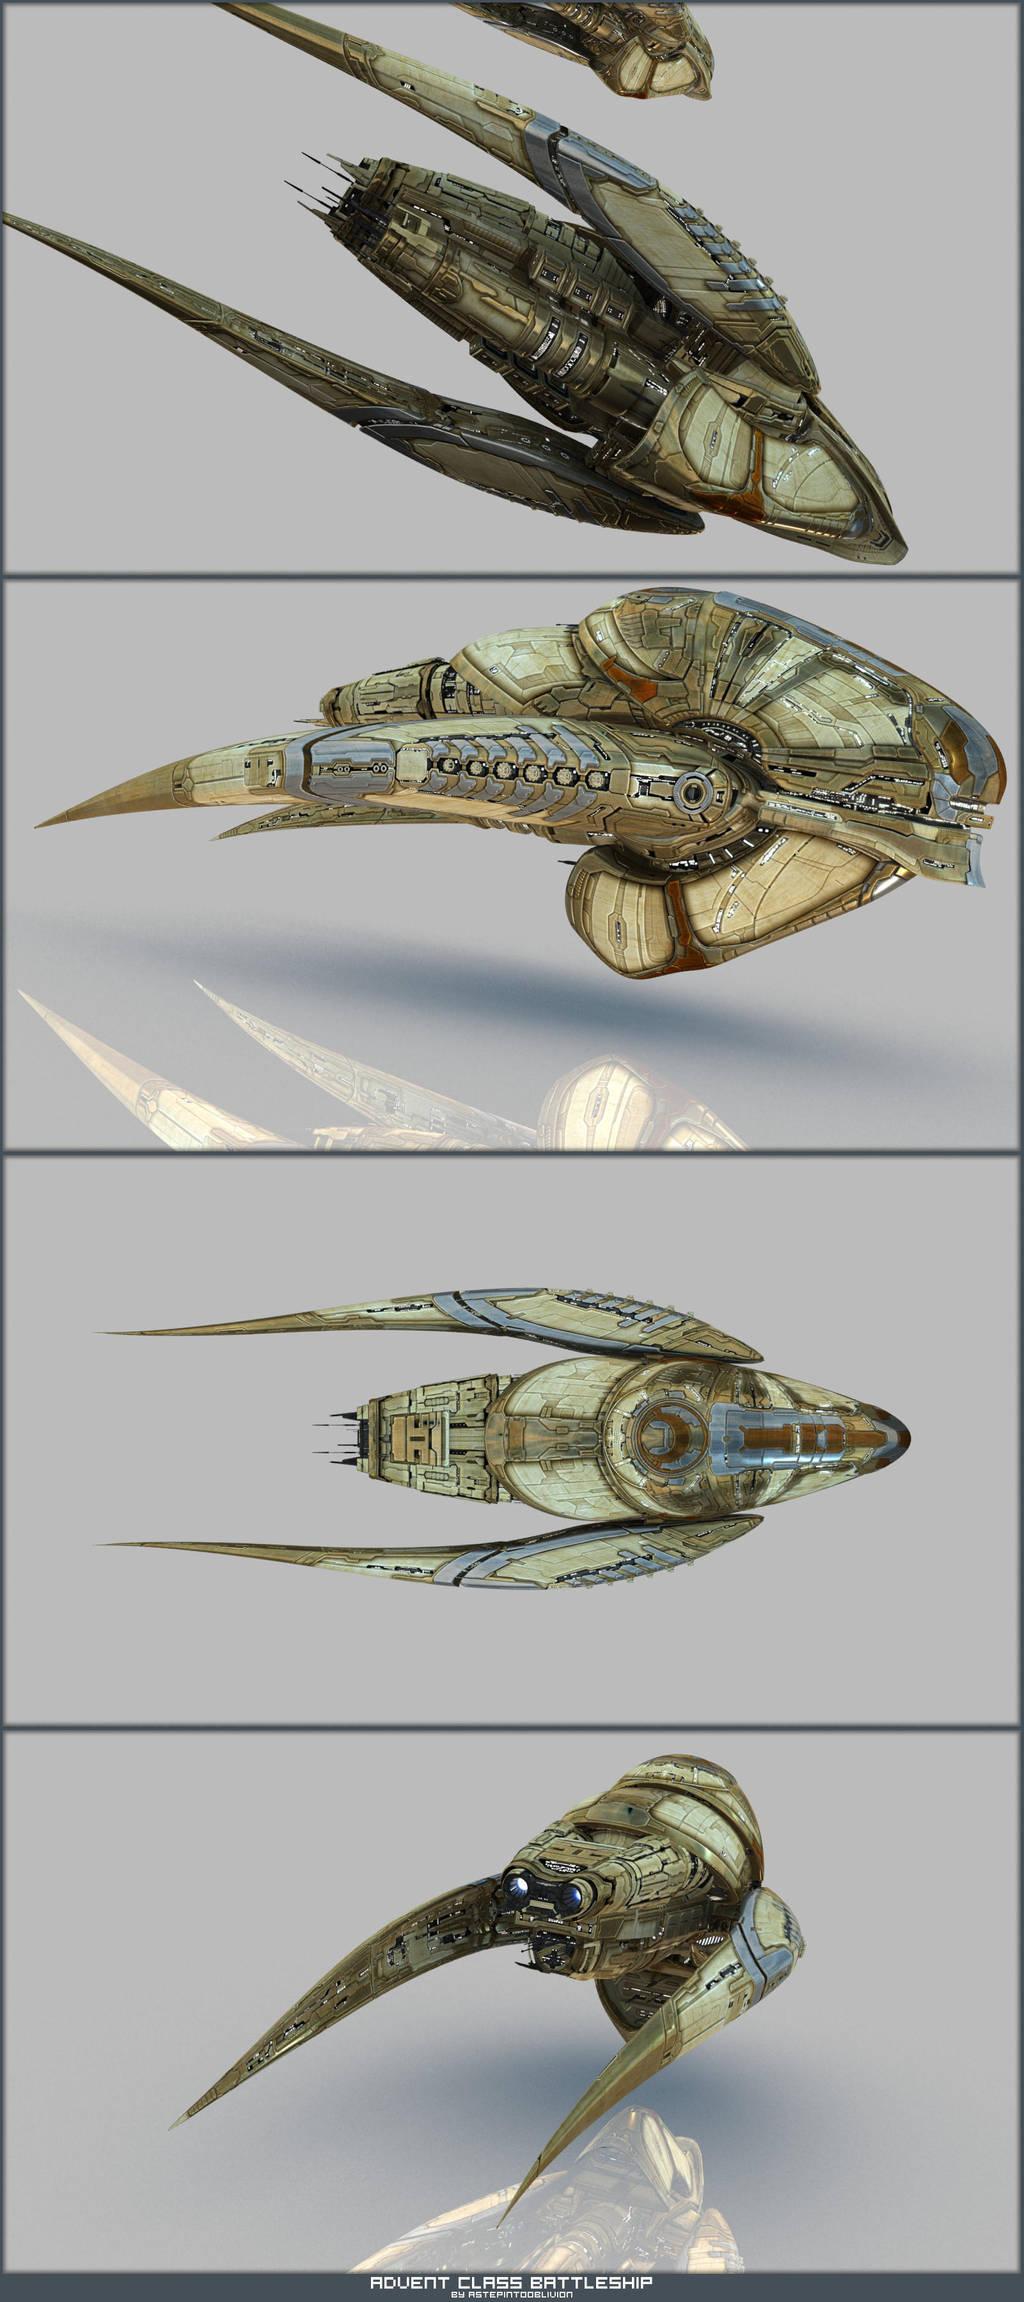 Advent Battleship Renders by AStepIntoOblivion